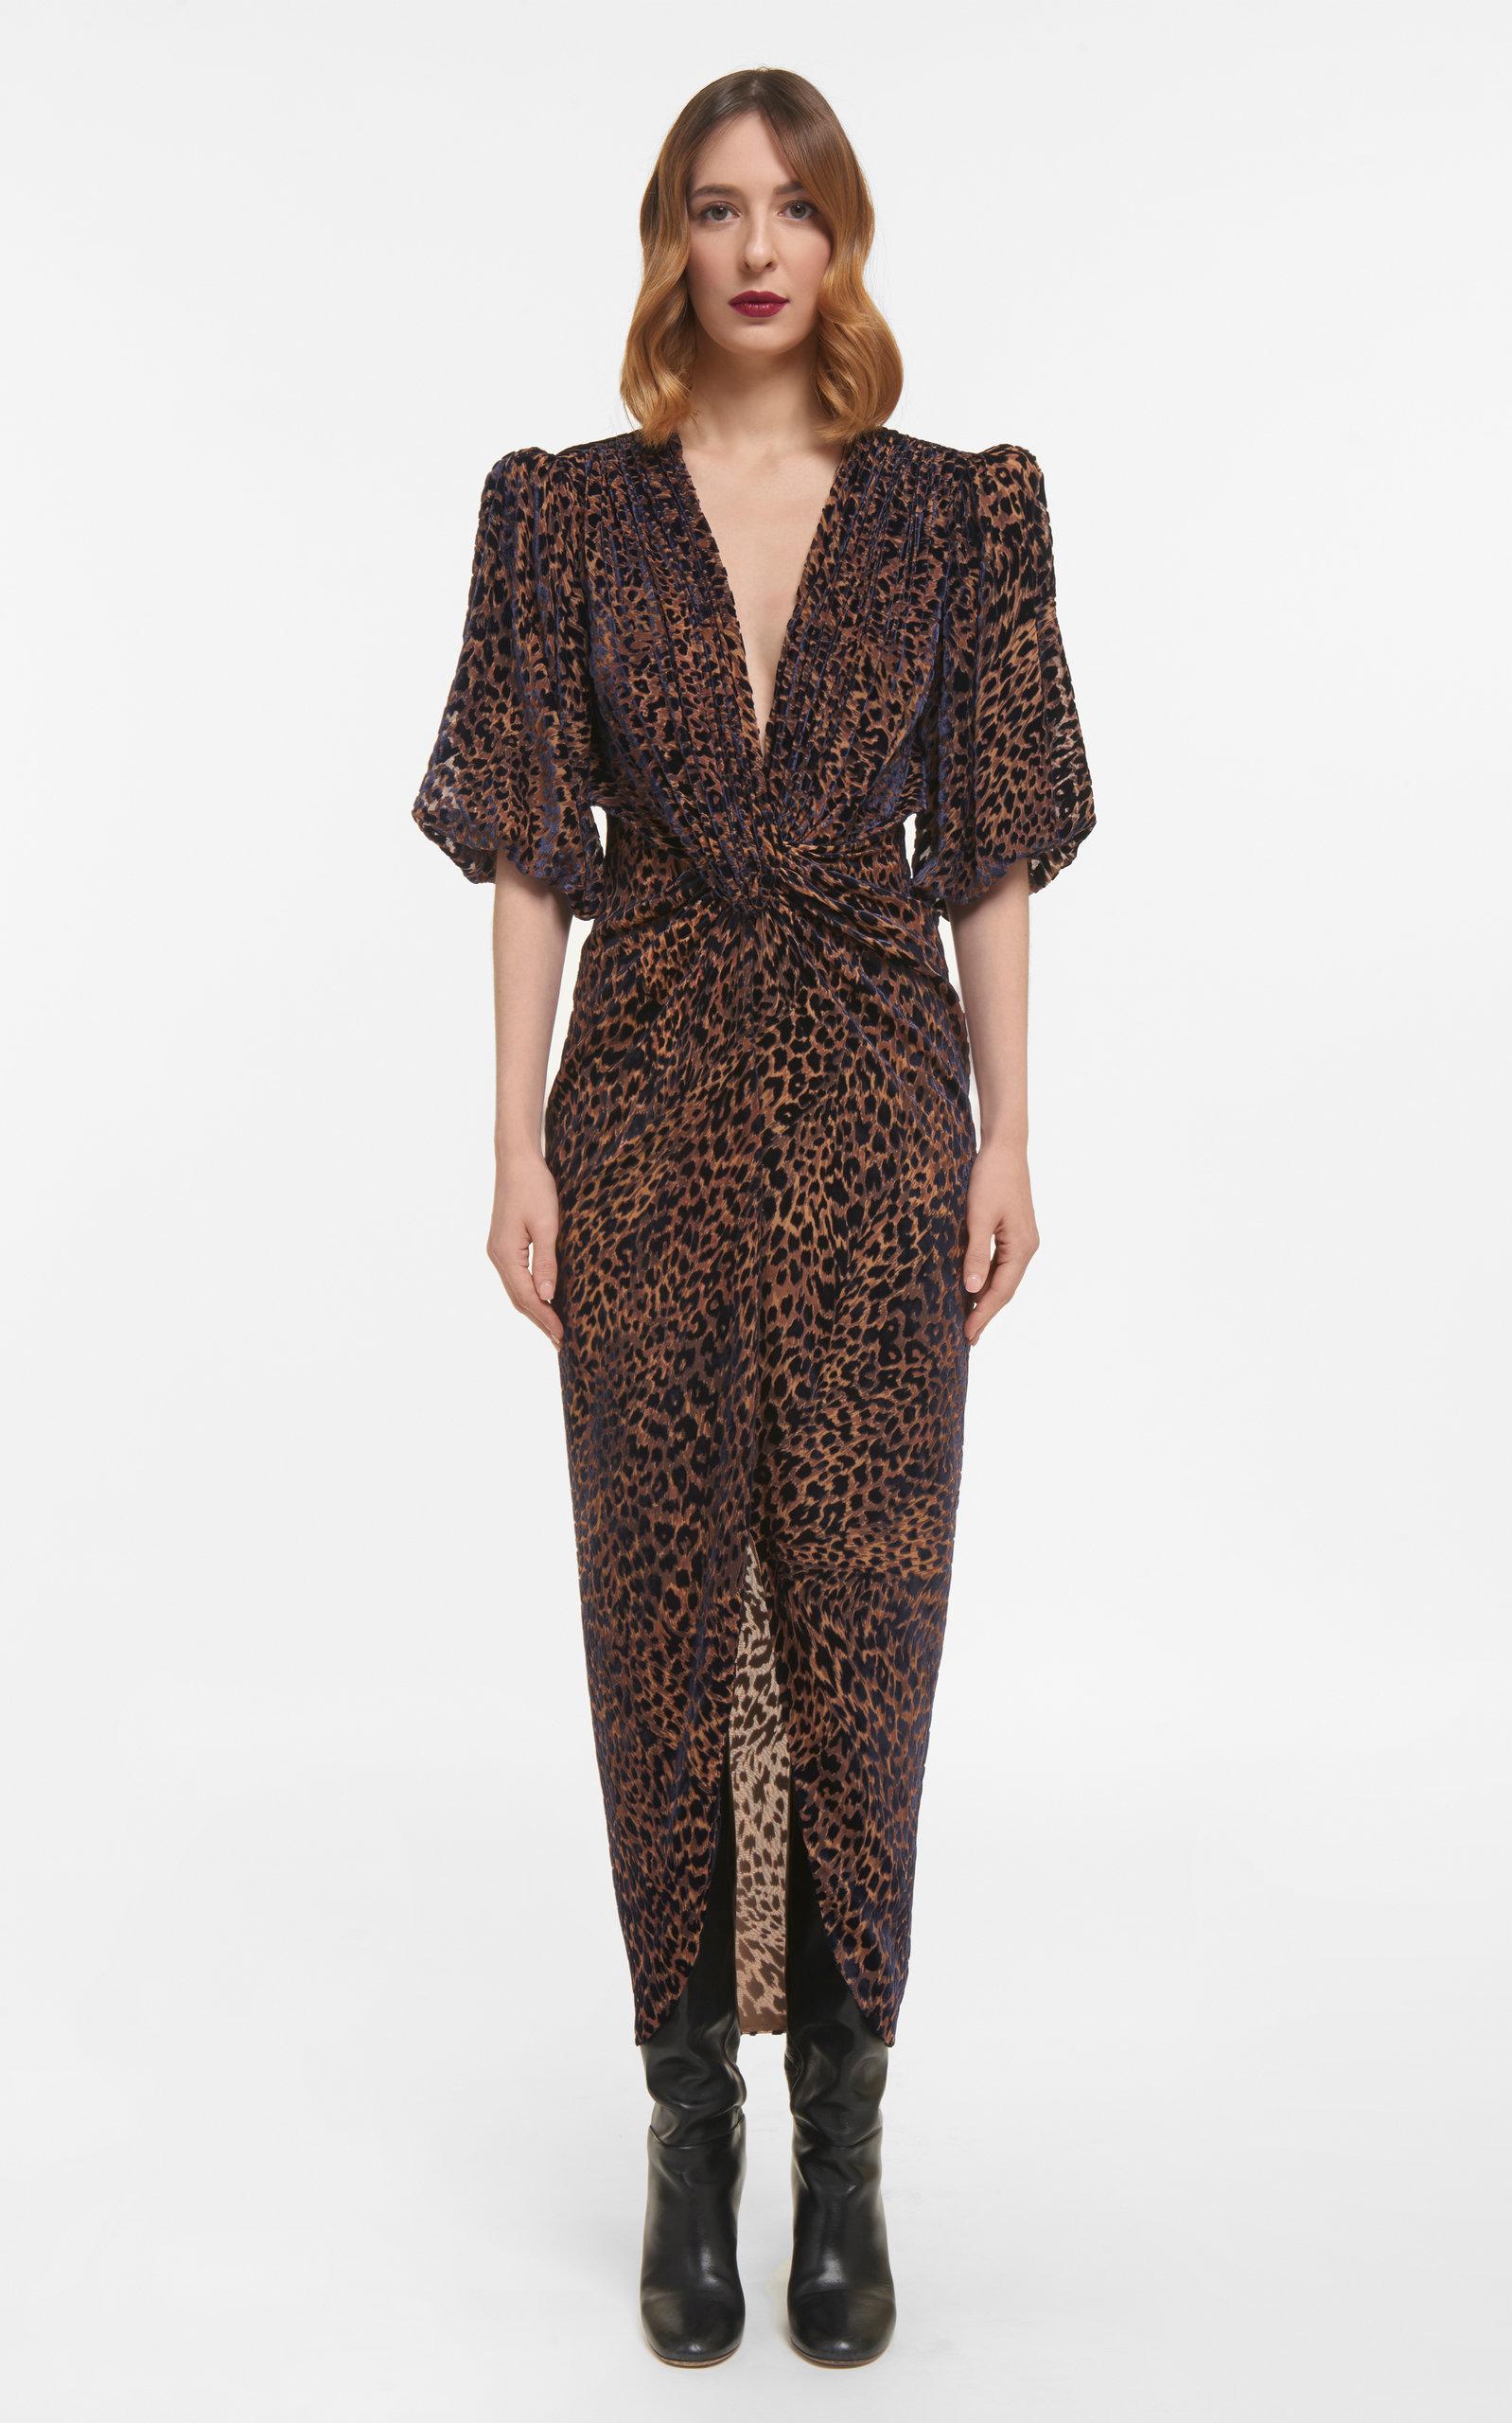 Women's Laria Flocked Leopard Velvet Devore Draped Dress With Knotted Waist Detail